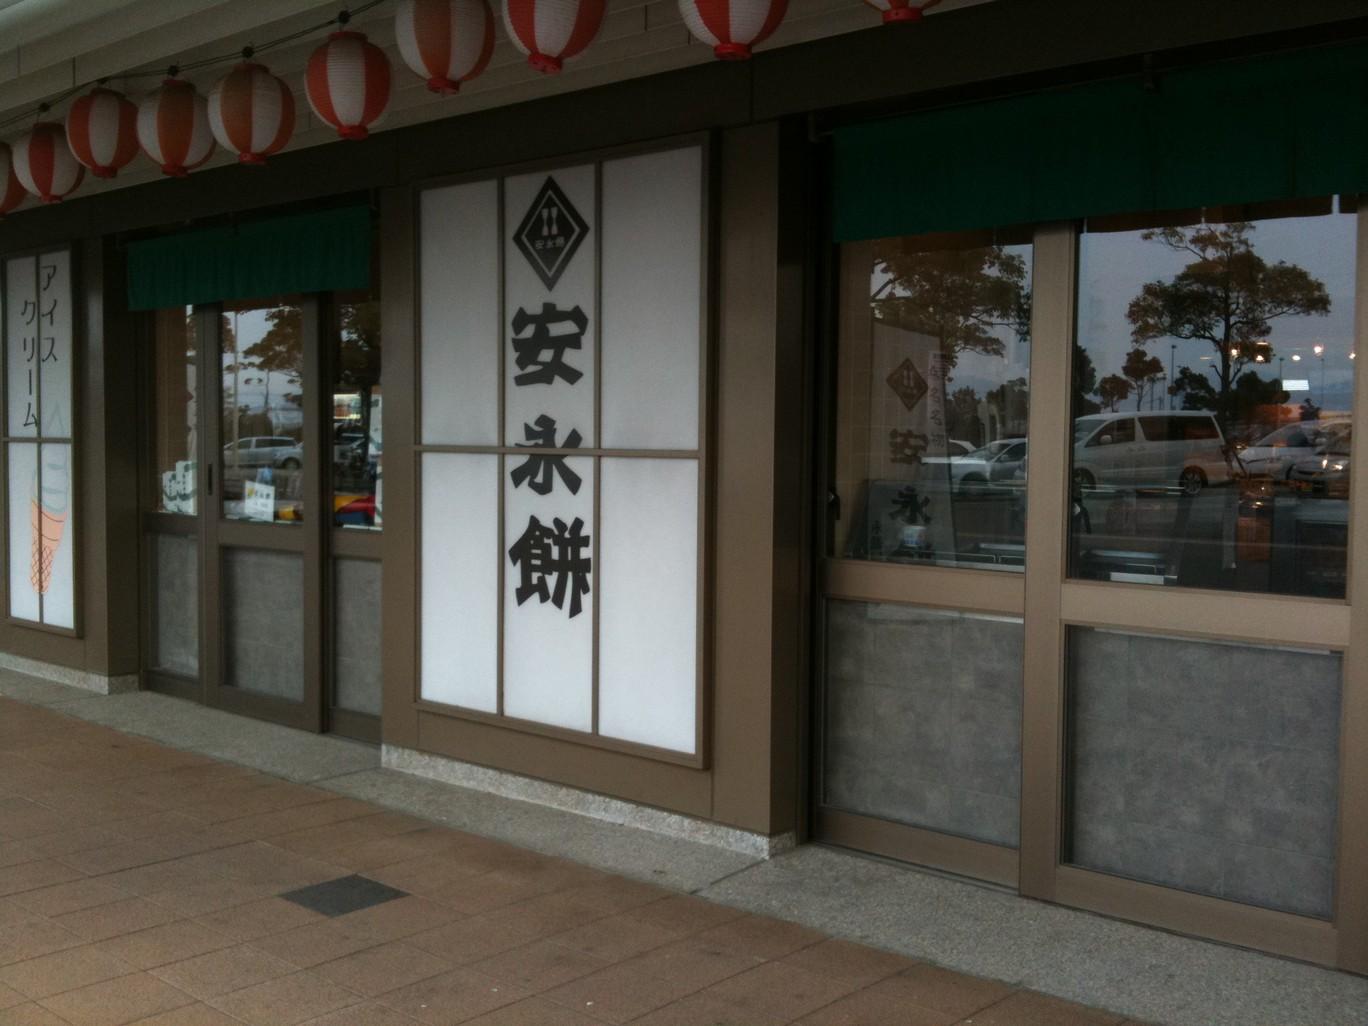 安永餅 湾岸長島PA 上り売店